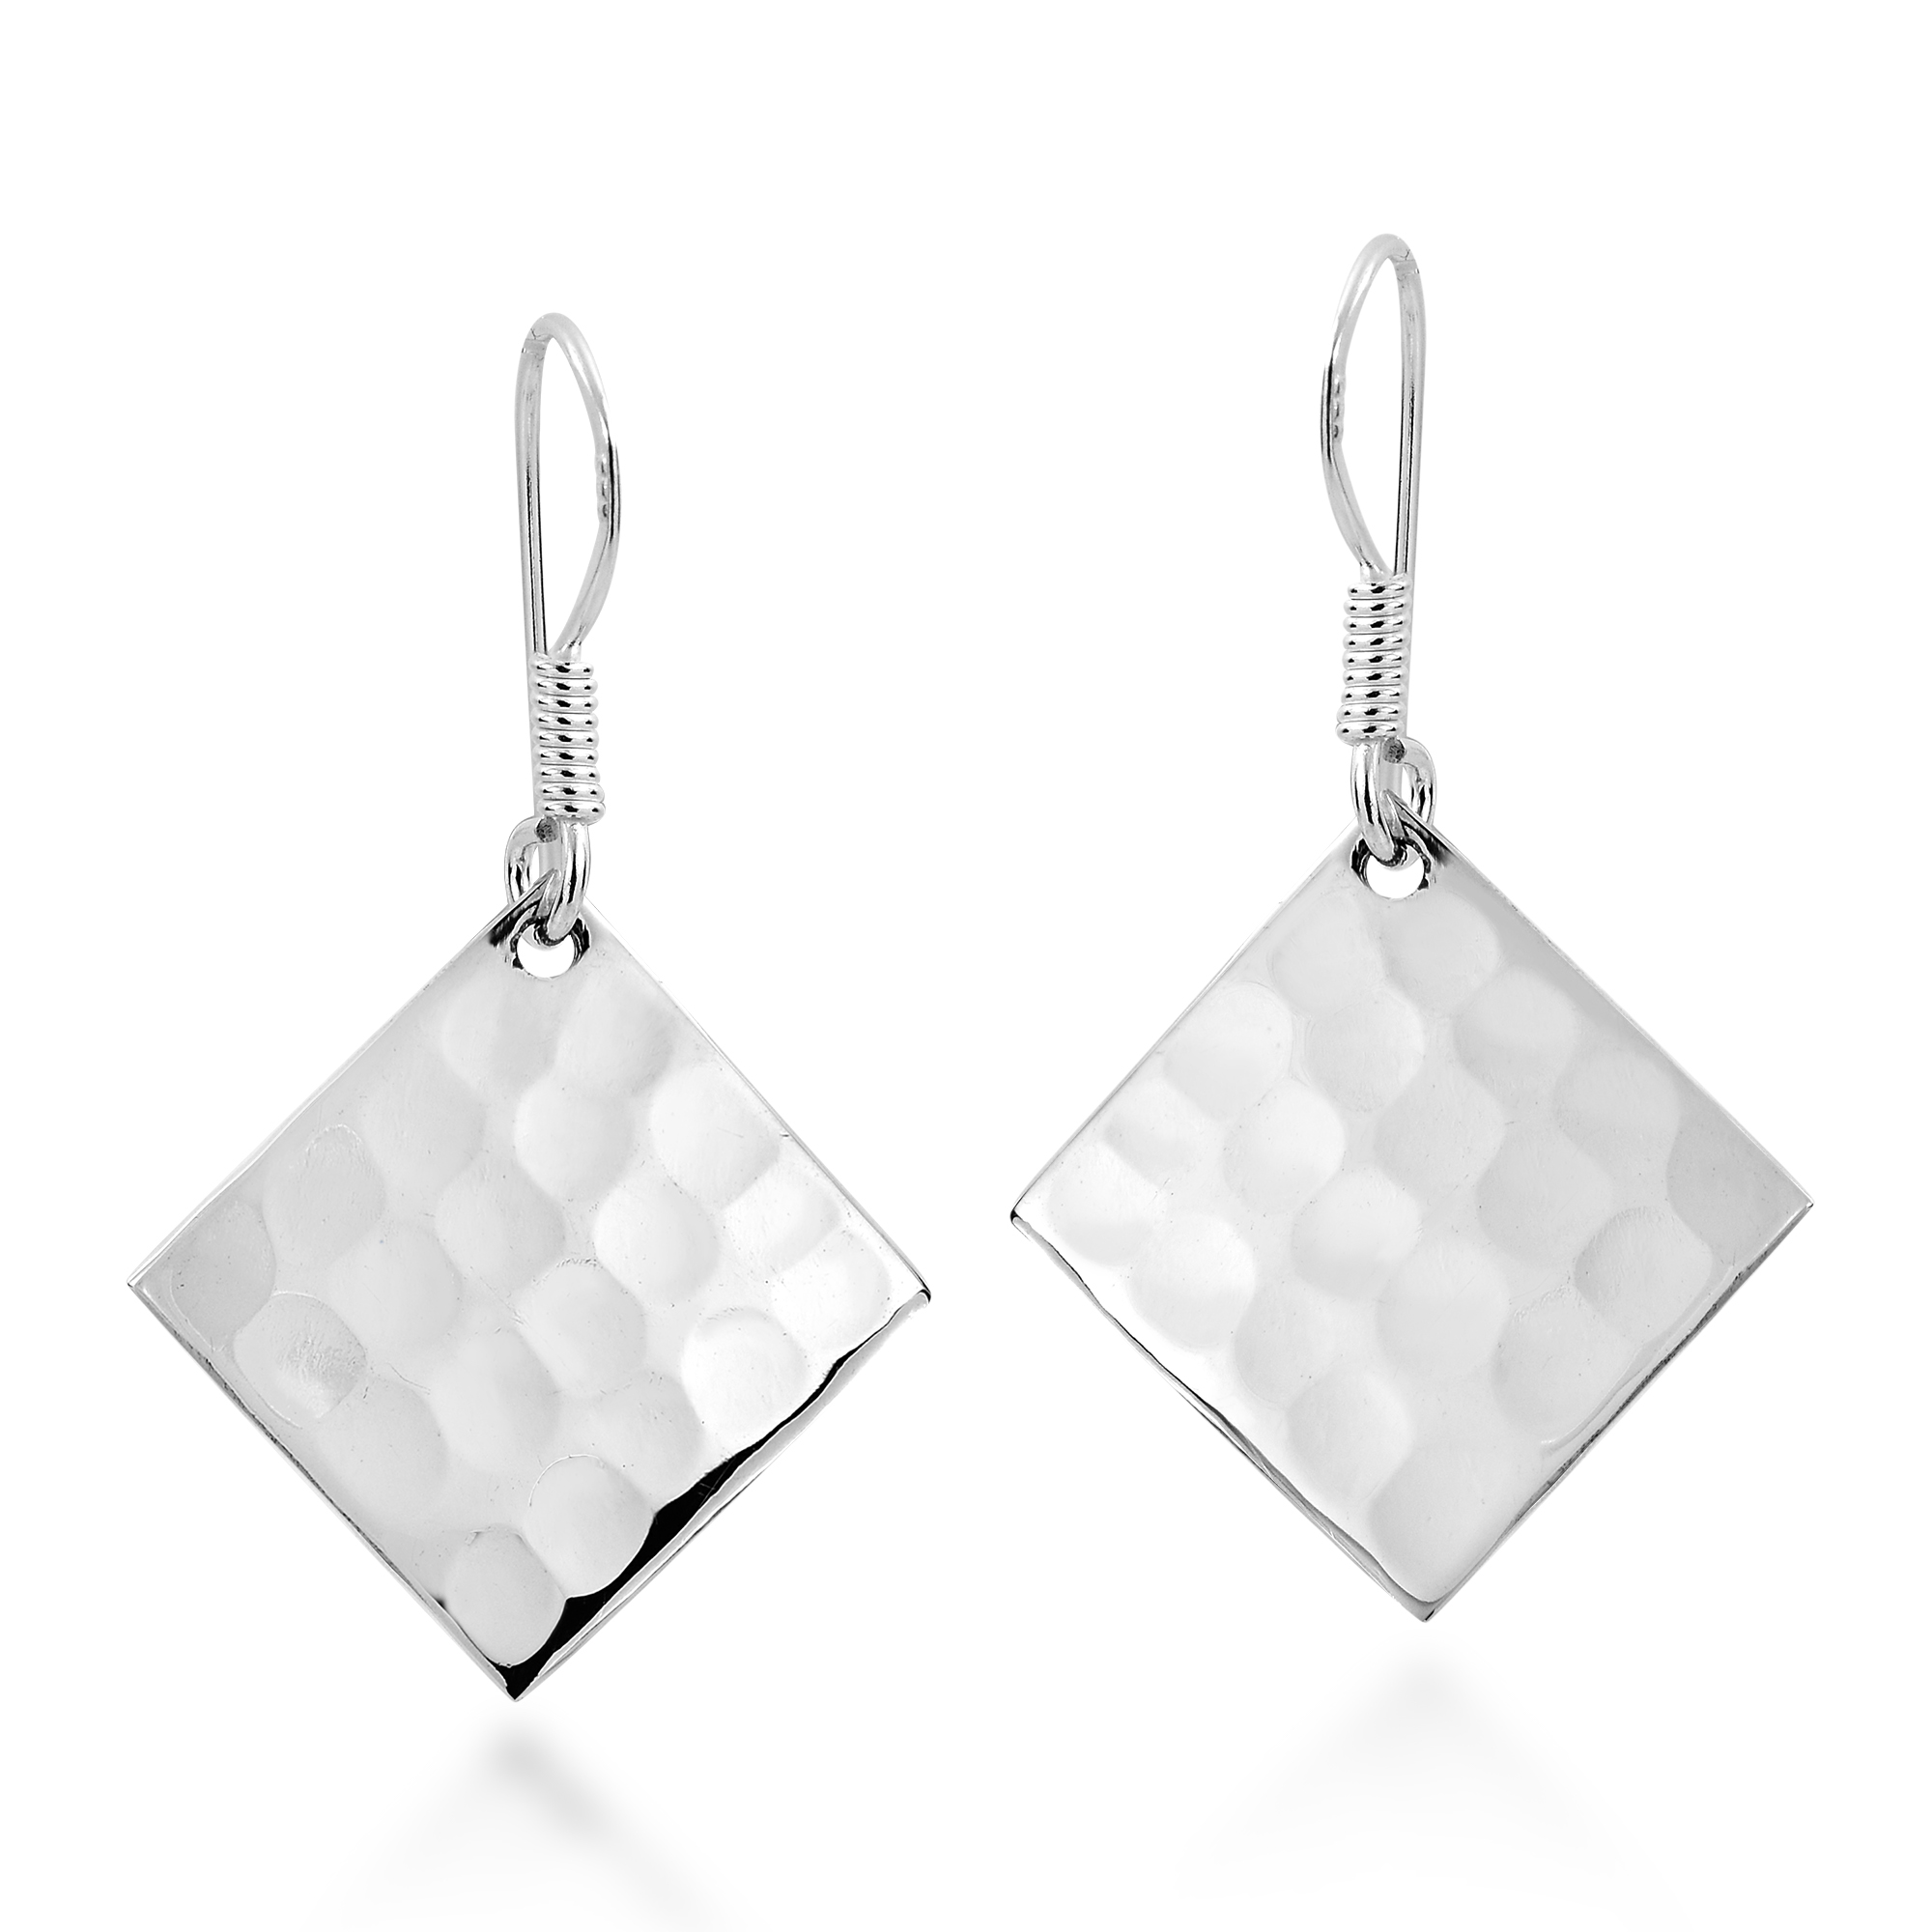 Hammer Texture Tilted Square .925 Silver Earrings - AeraVida